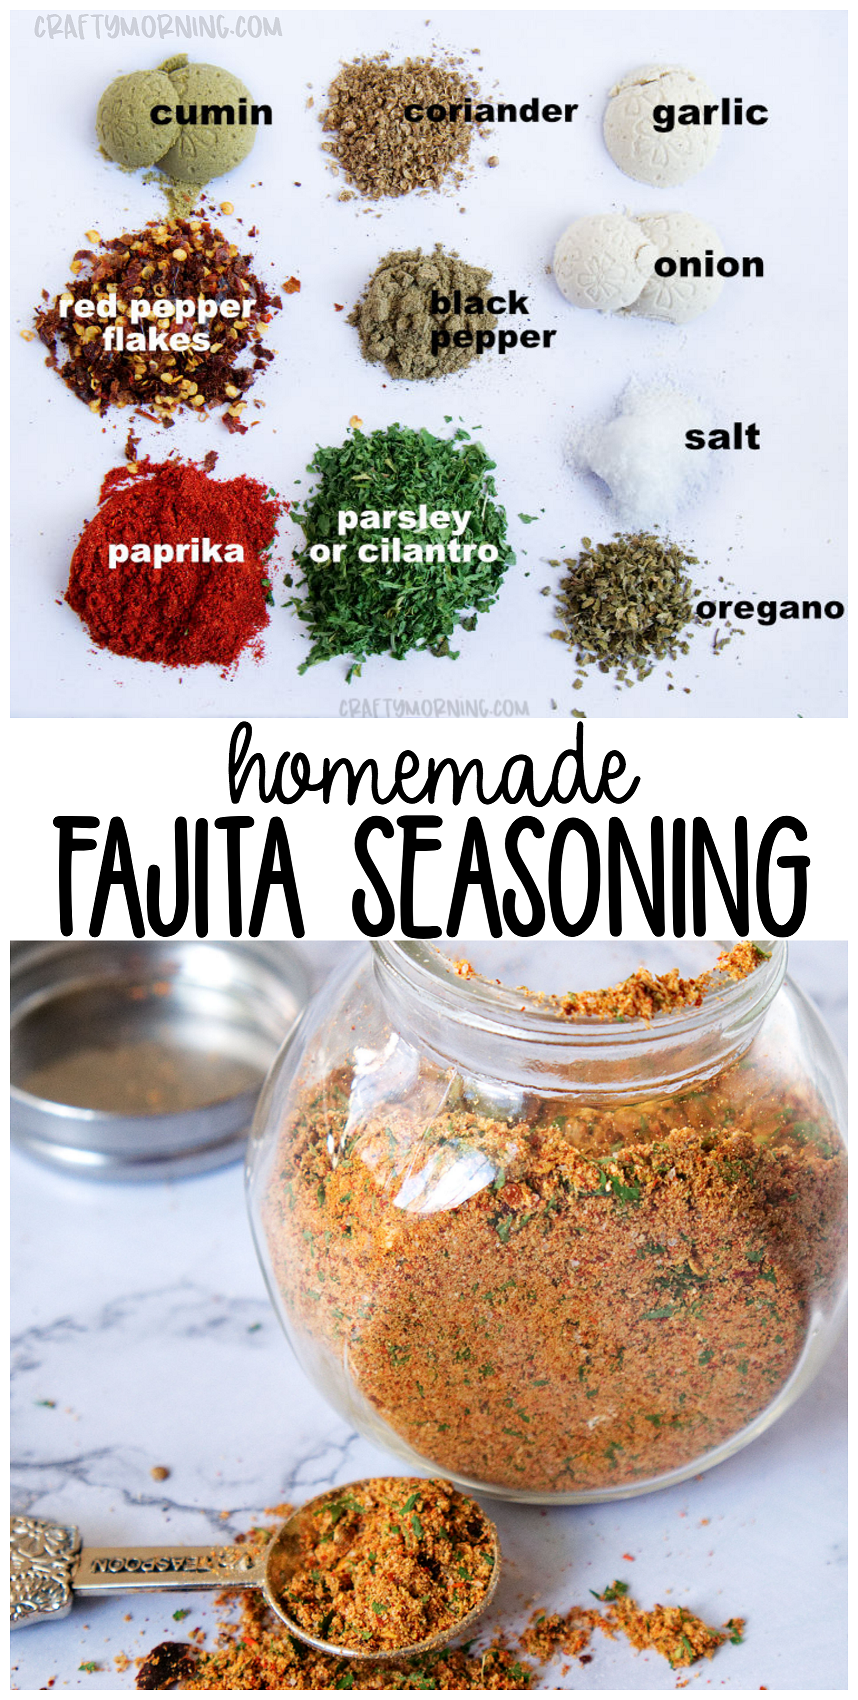 Homemade Fajita Seasoning Mix Recipe Fajita Seasoning Mix Spice Mix Recipes Homemade Fajita Seasoning